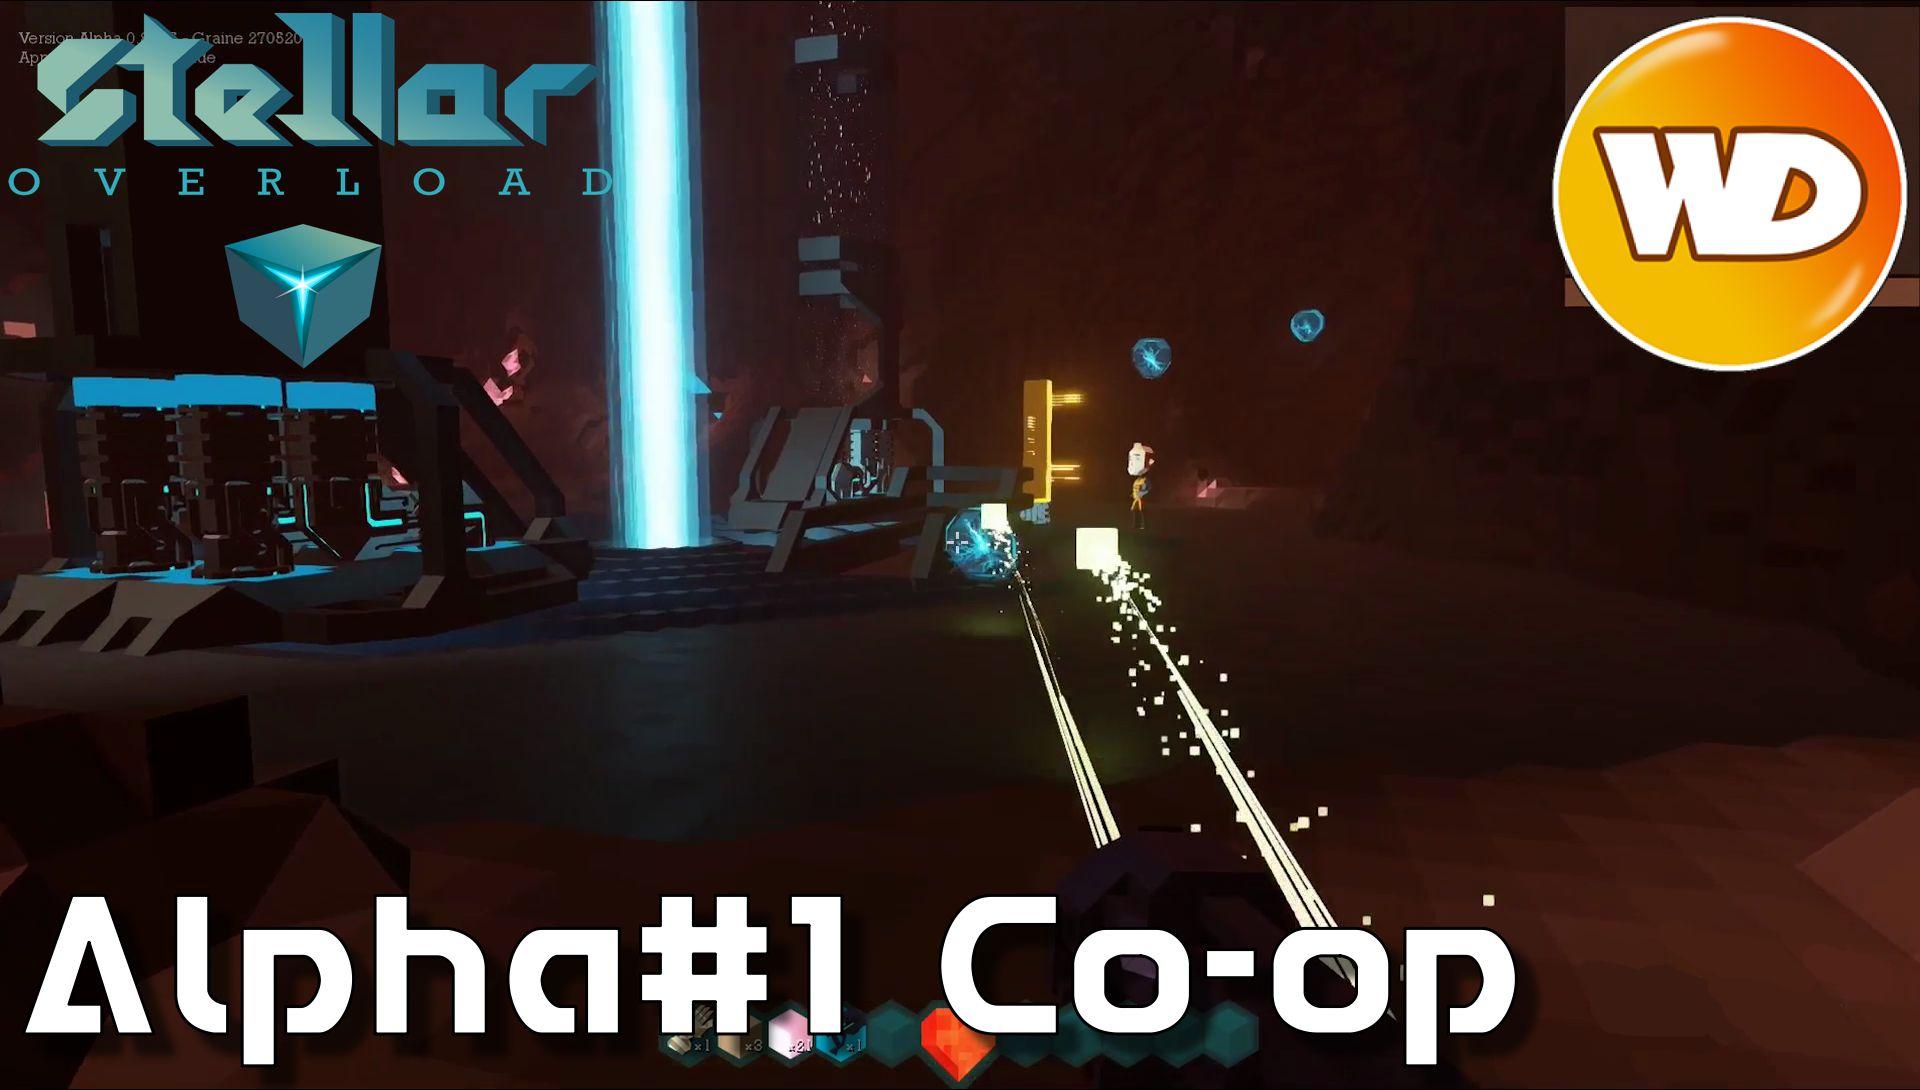 Planets Cube / Stellar Overload - FR - Coop - Alpha 1 - intégral